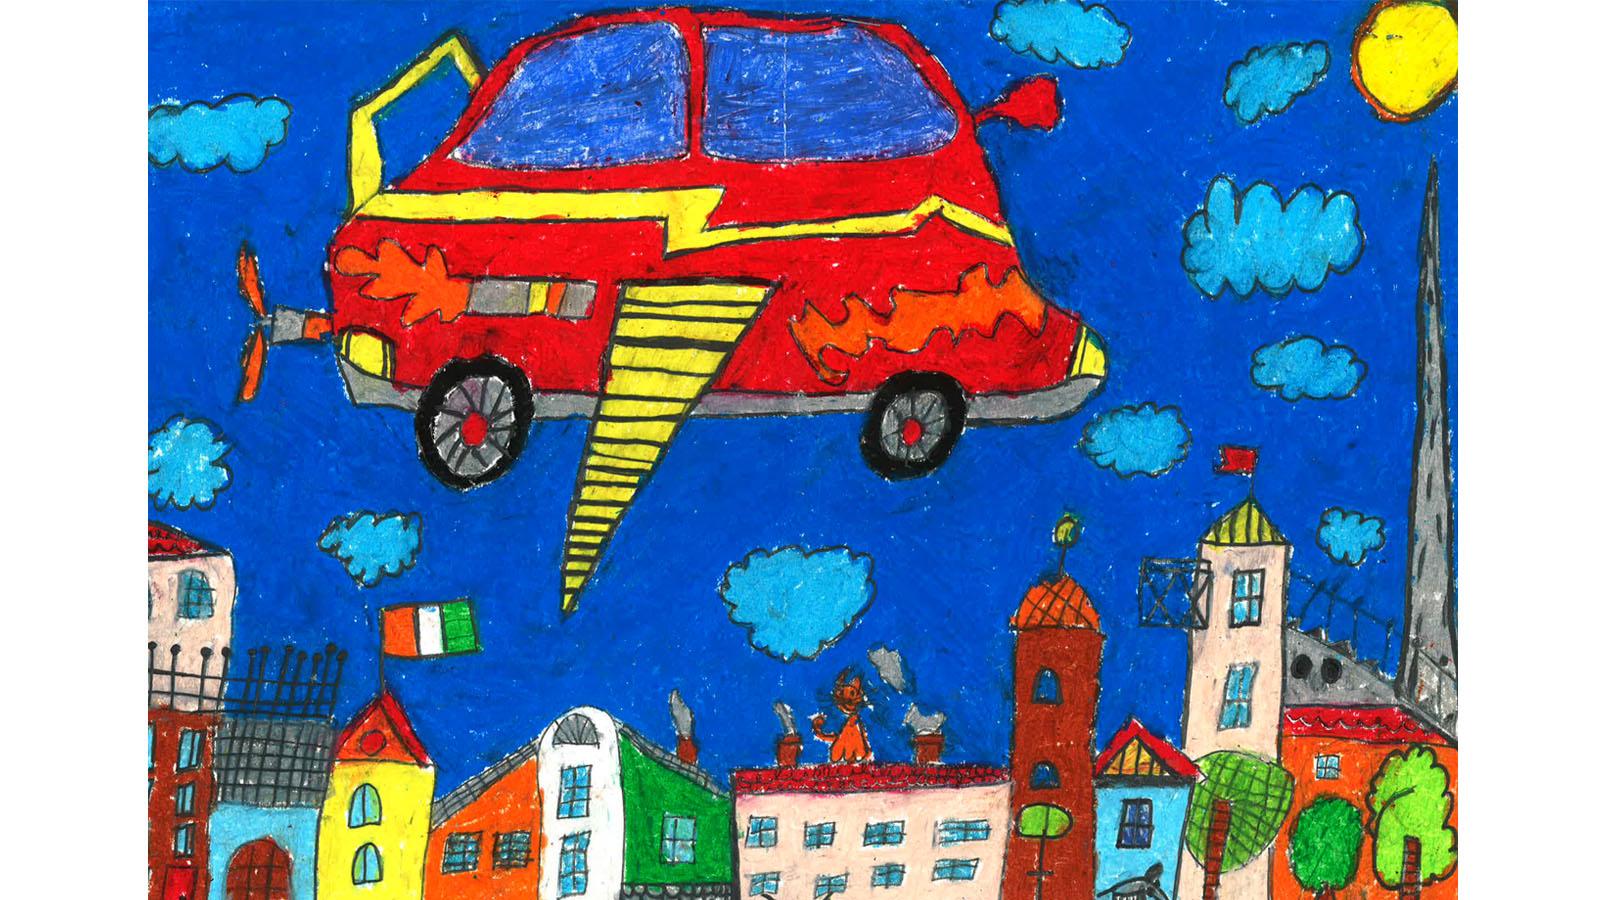 toyota ireland announces dream car art contest finalists